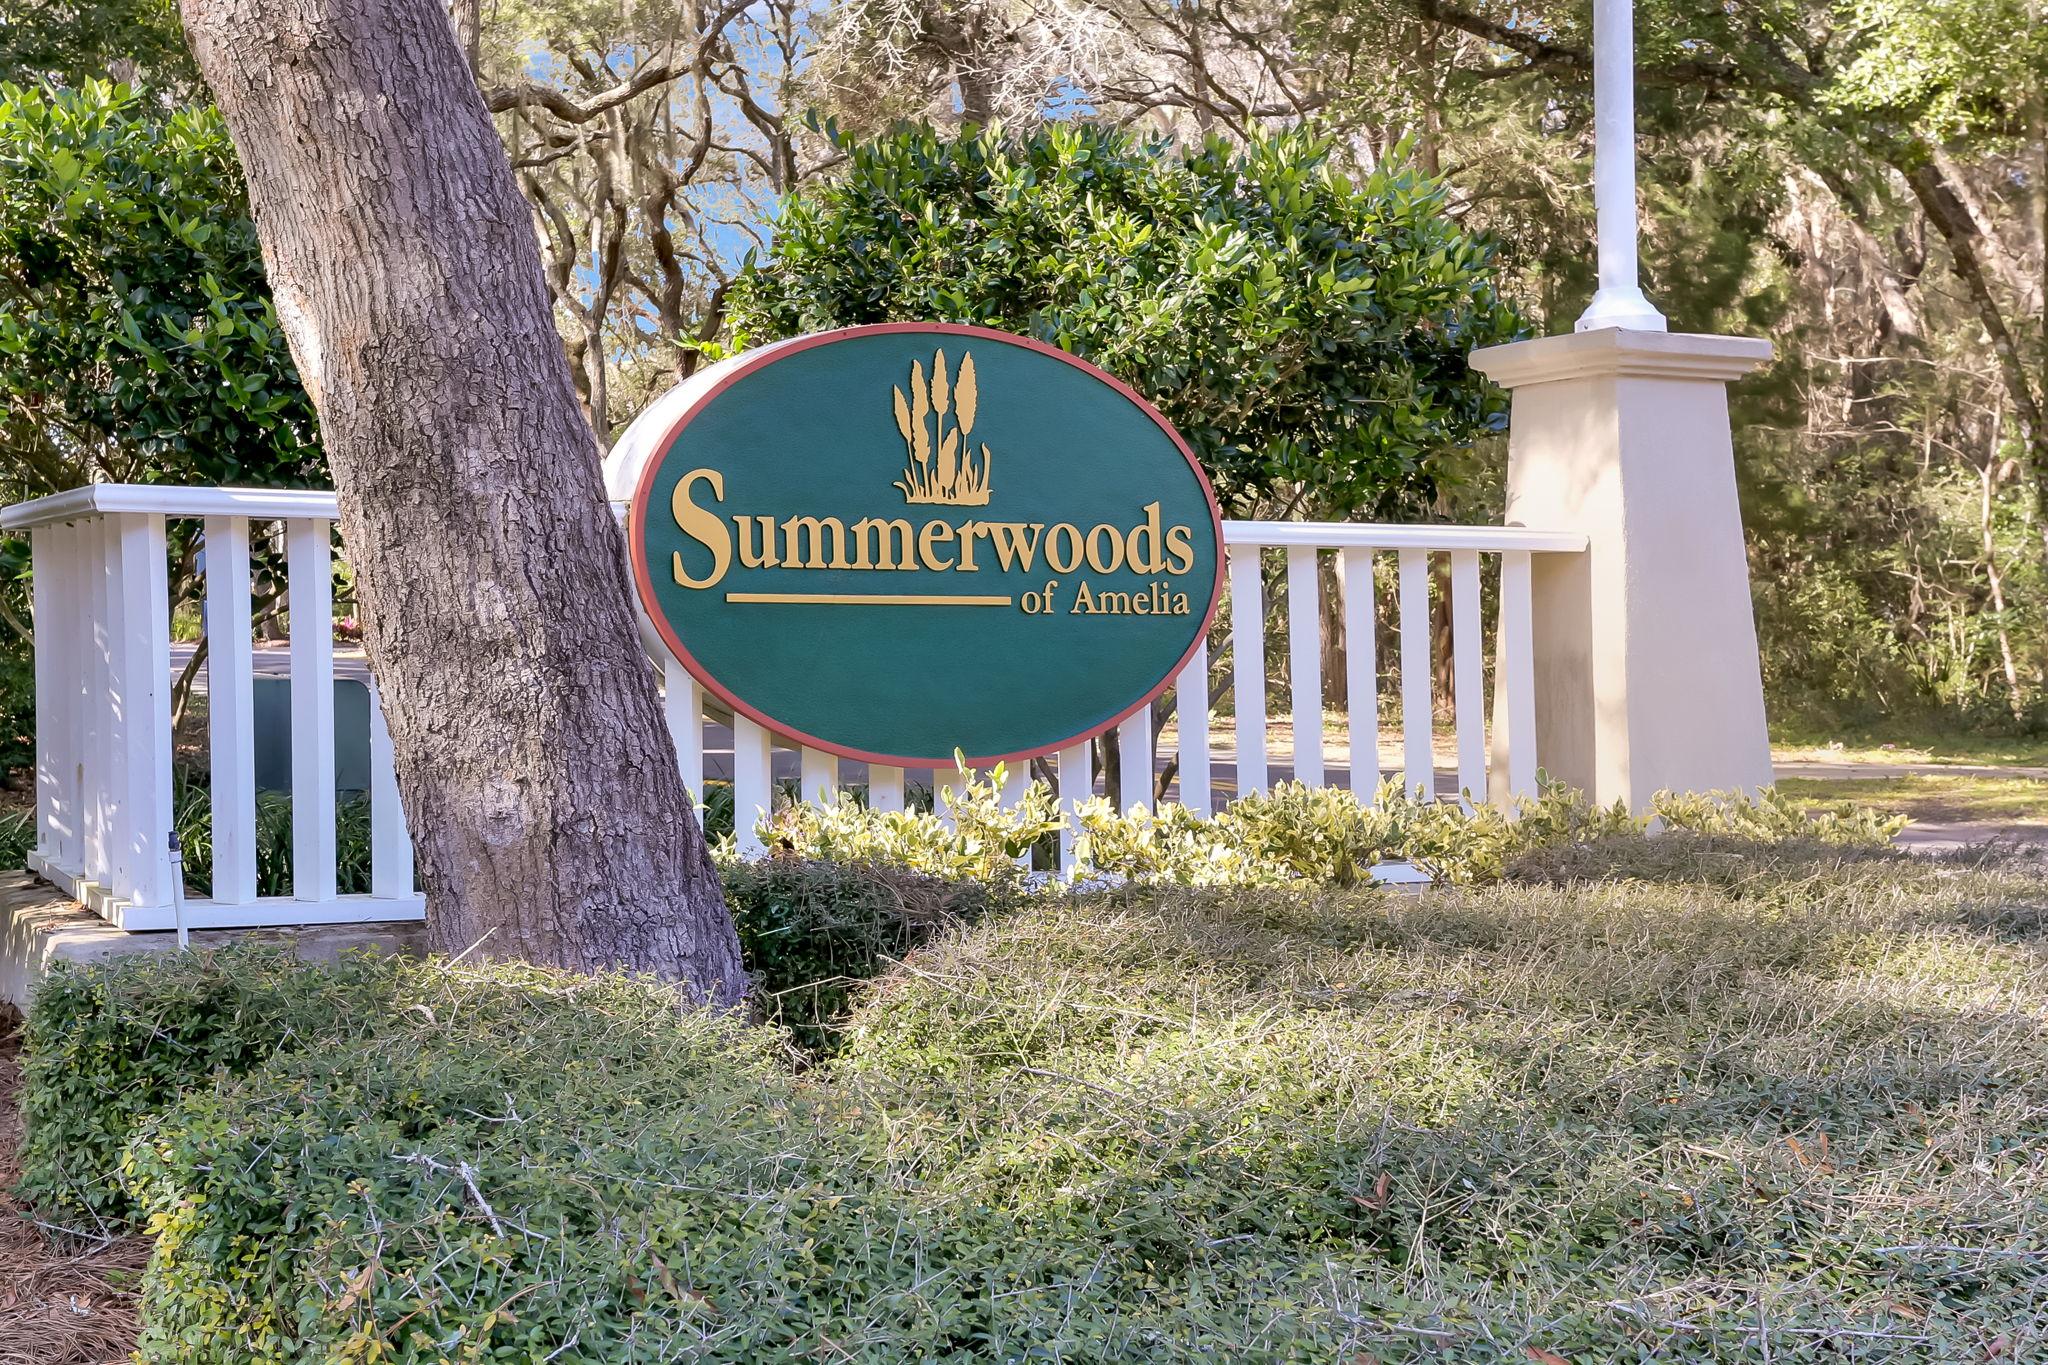 Summerwoods